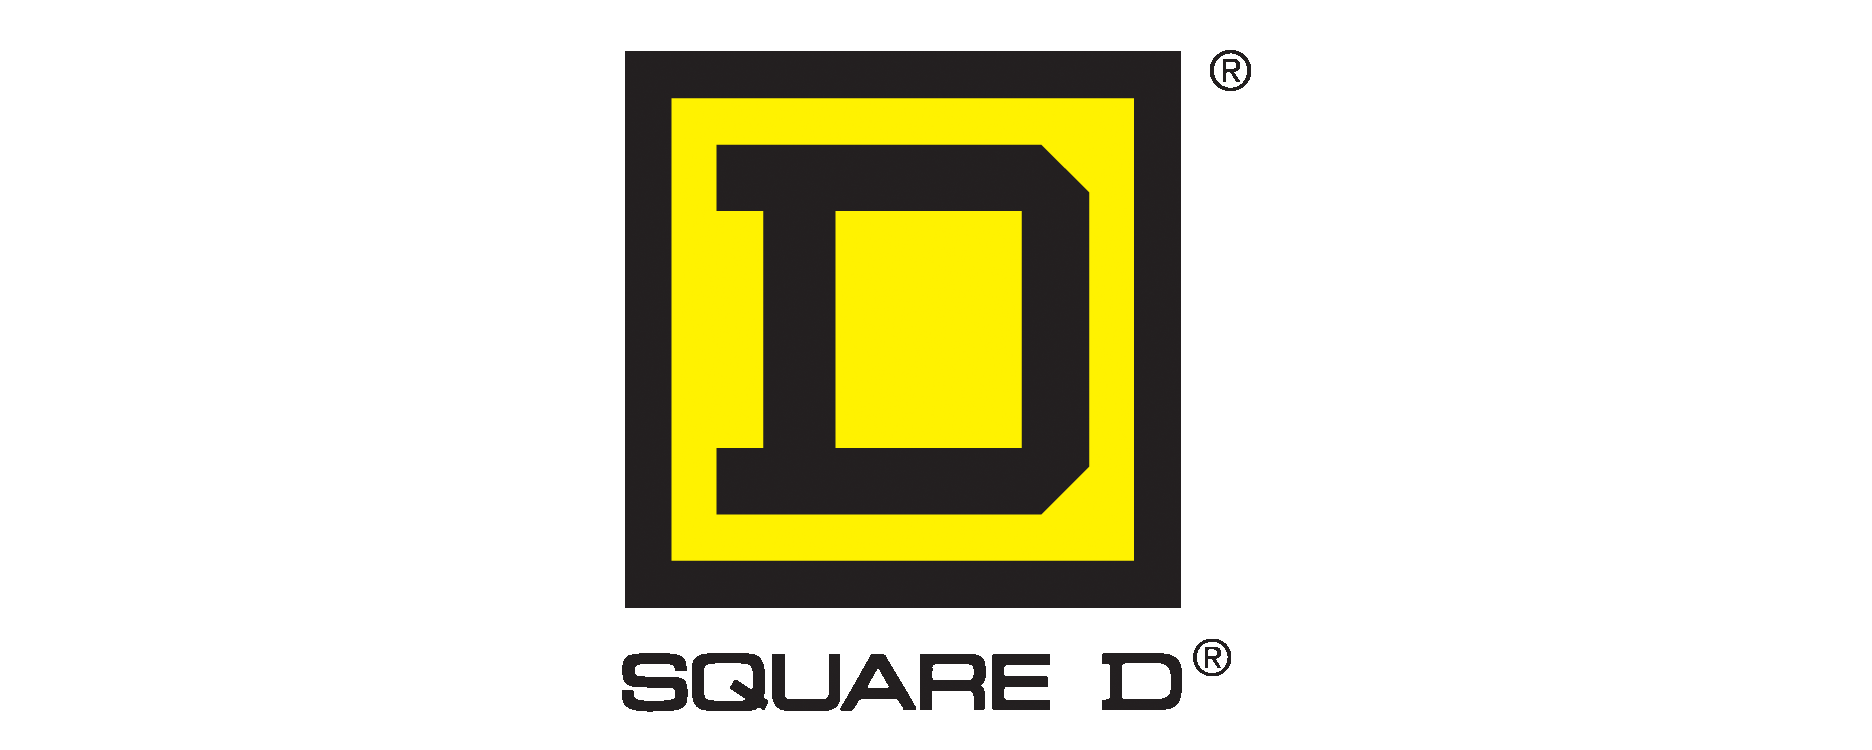 Square-D-Small-Logo